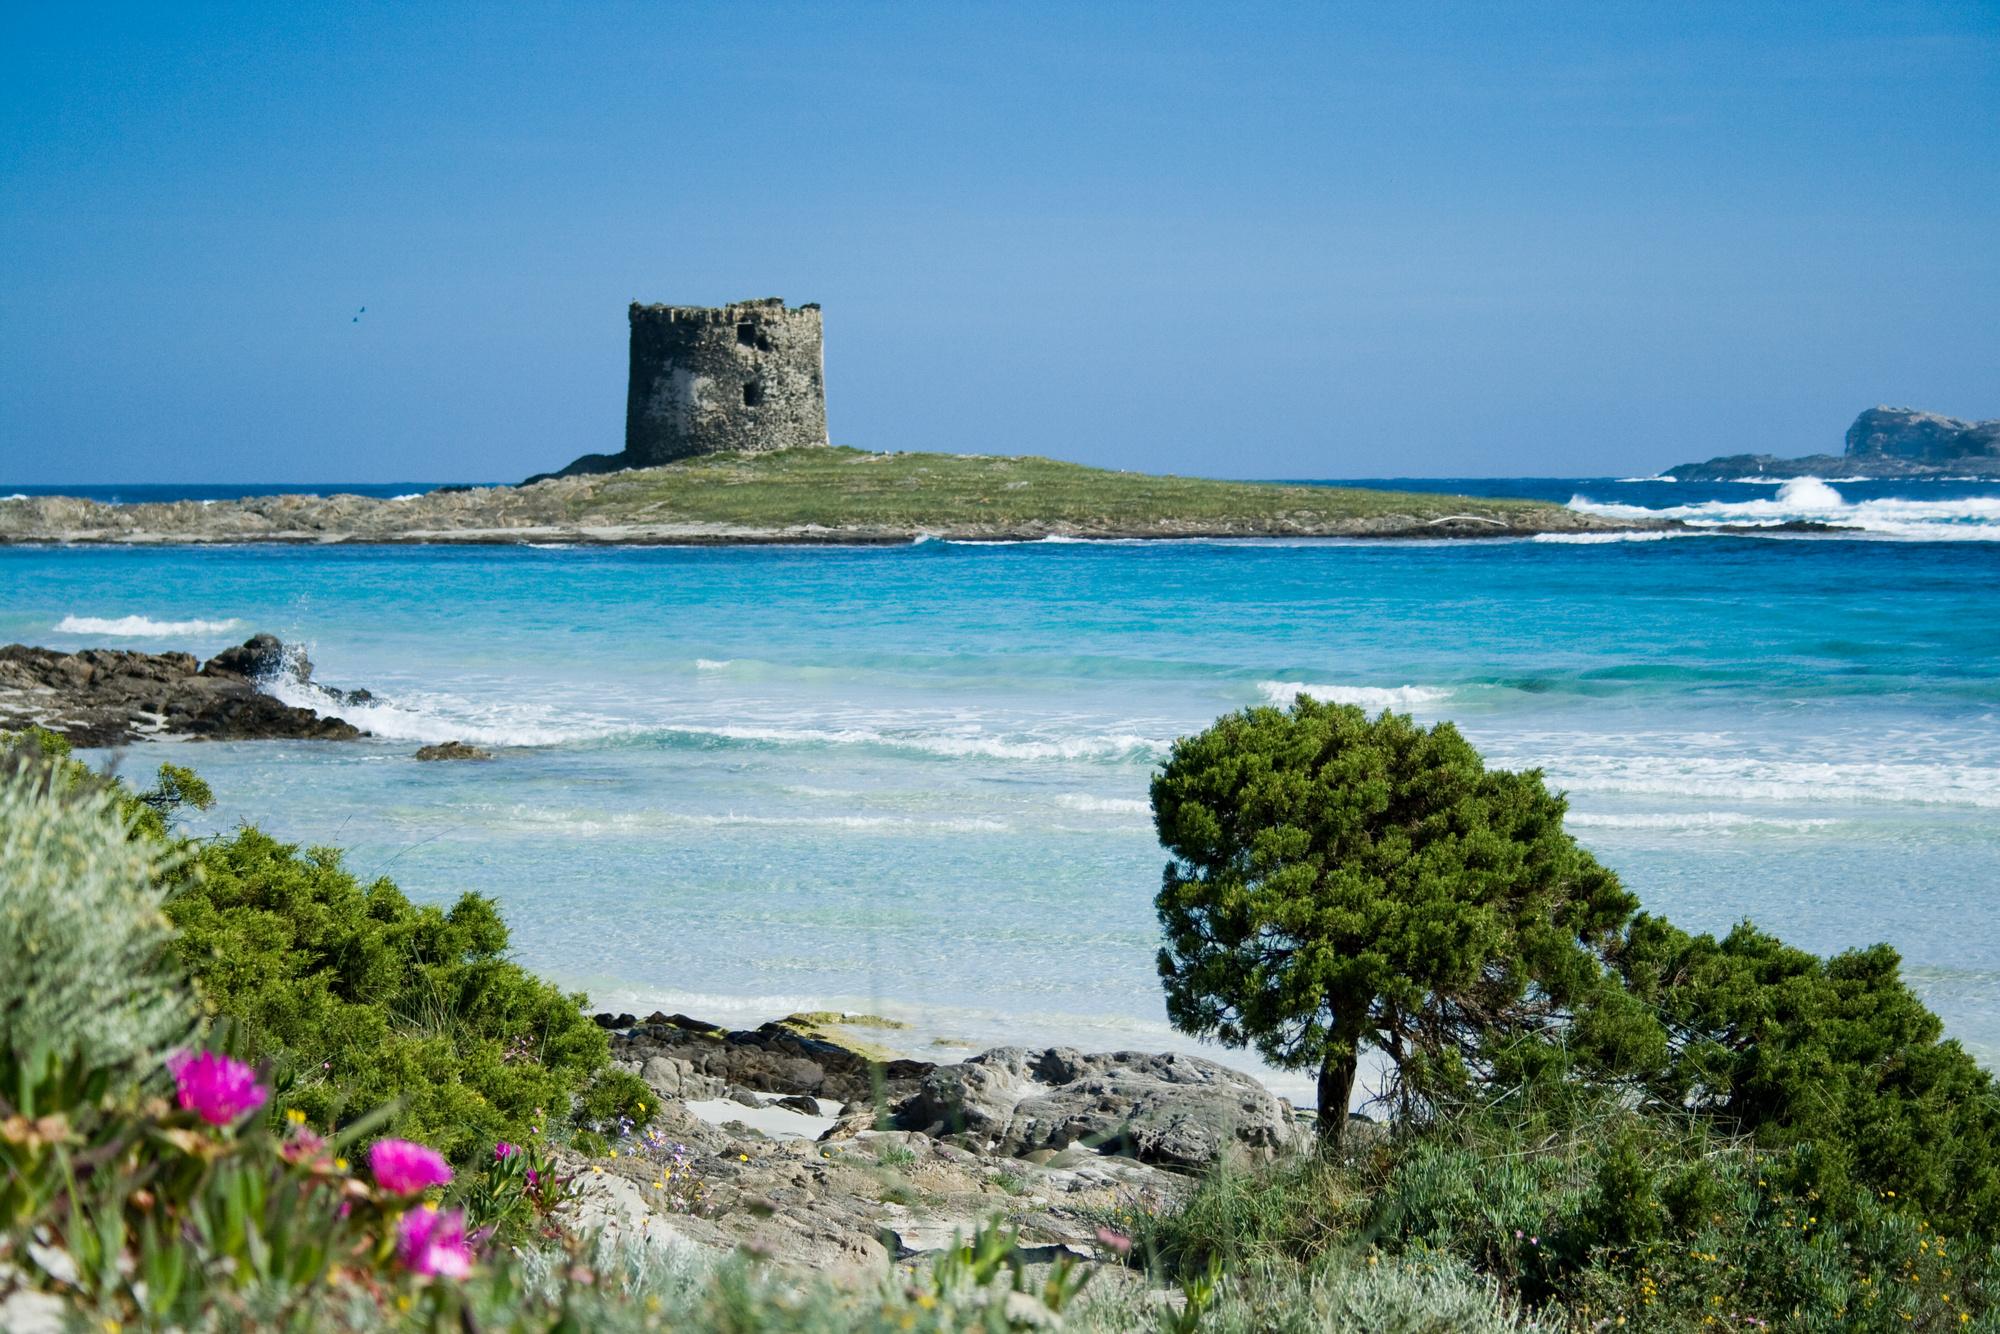 Vista dall'Asinara, Stintino (SS)